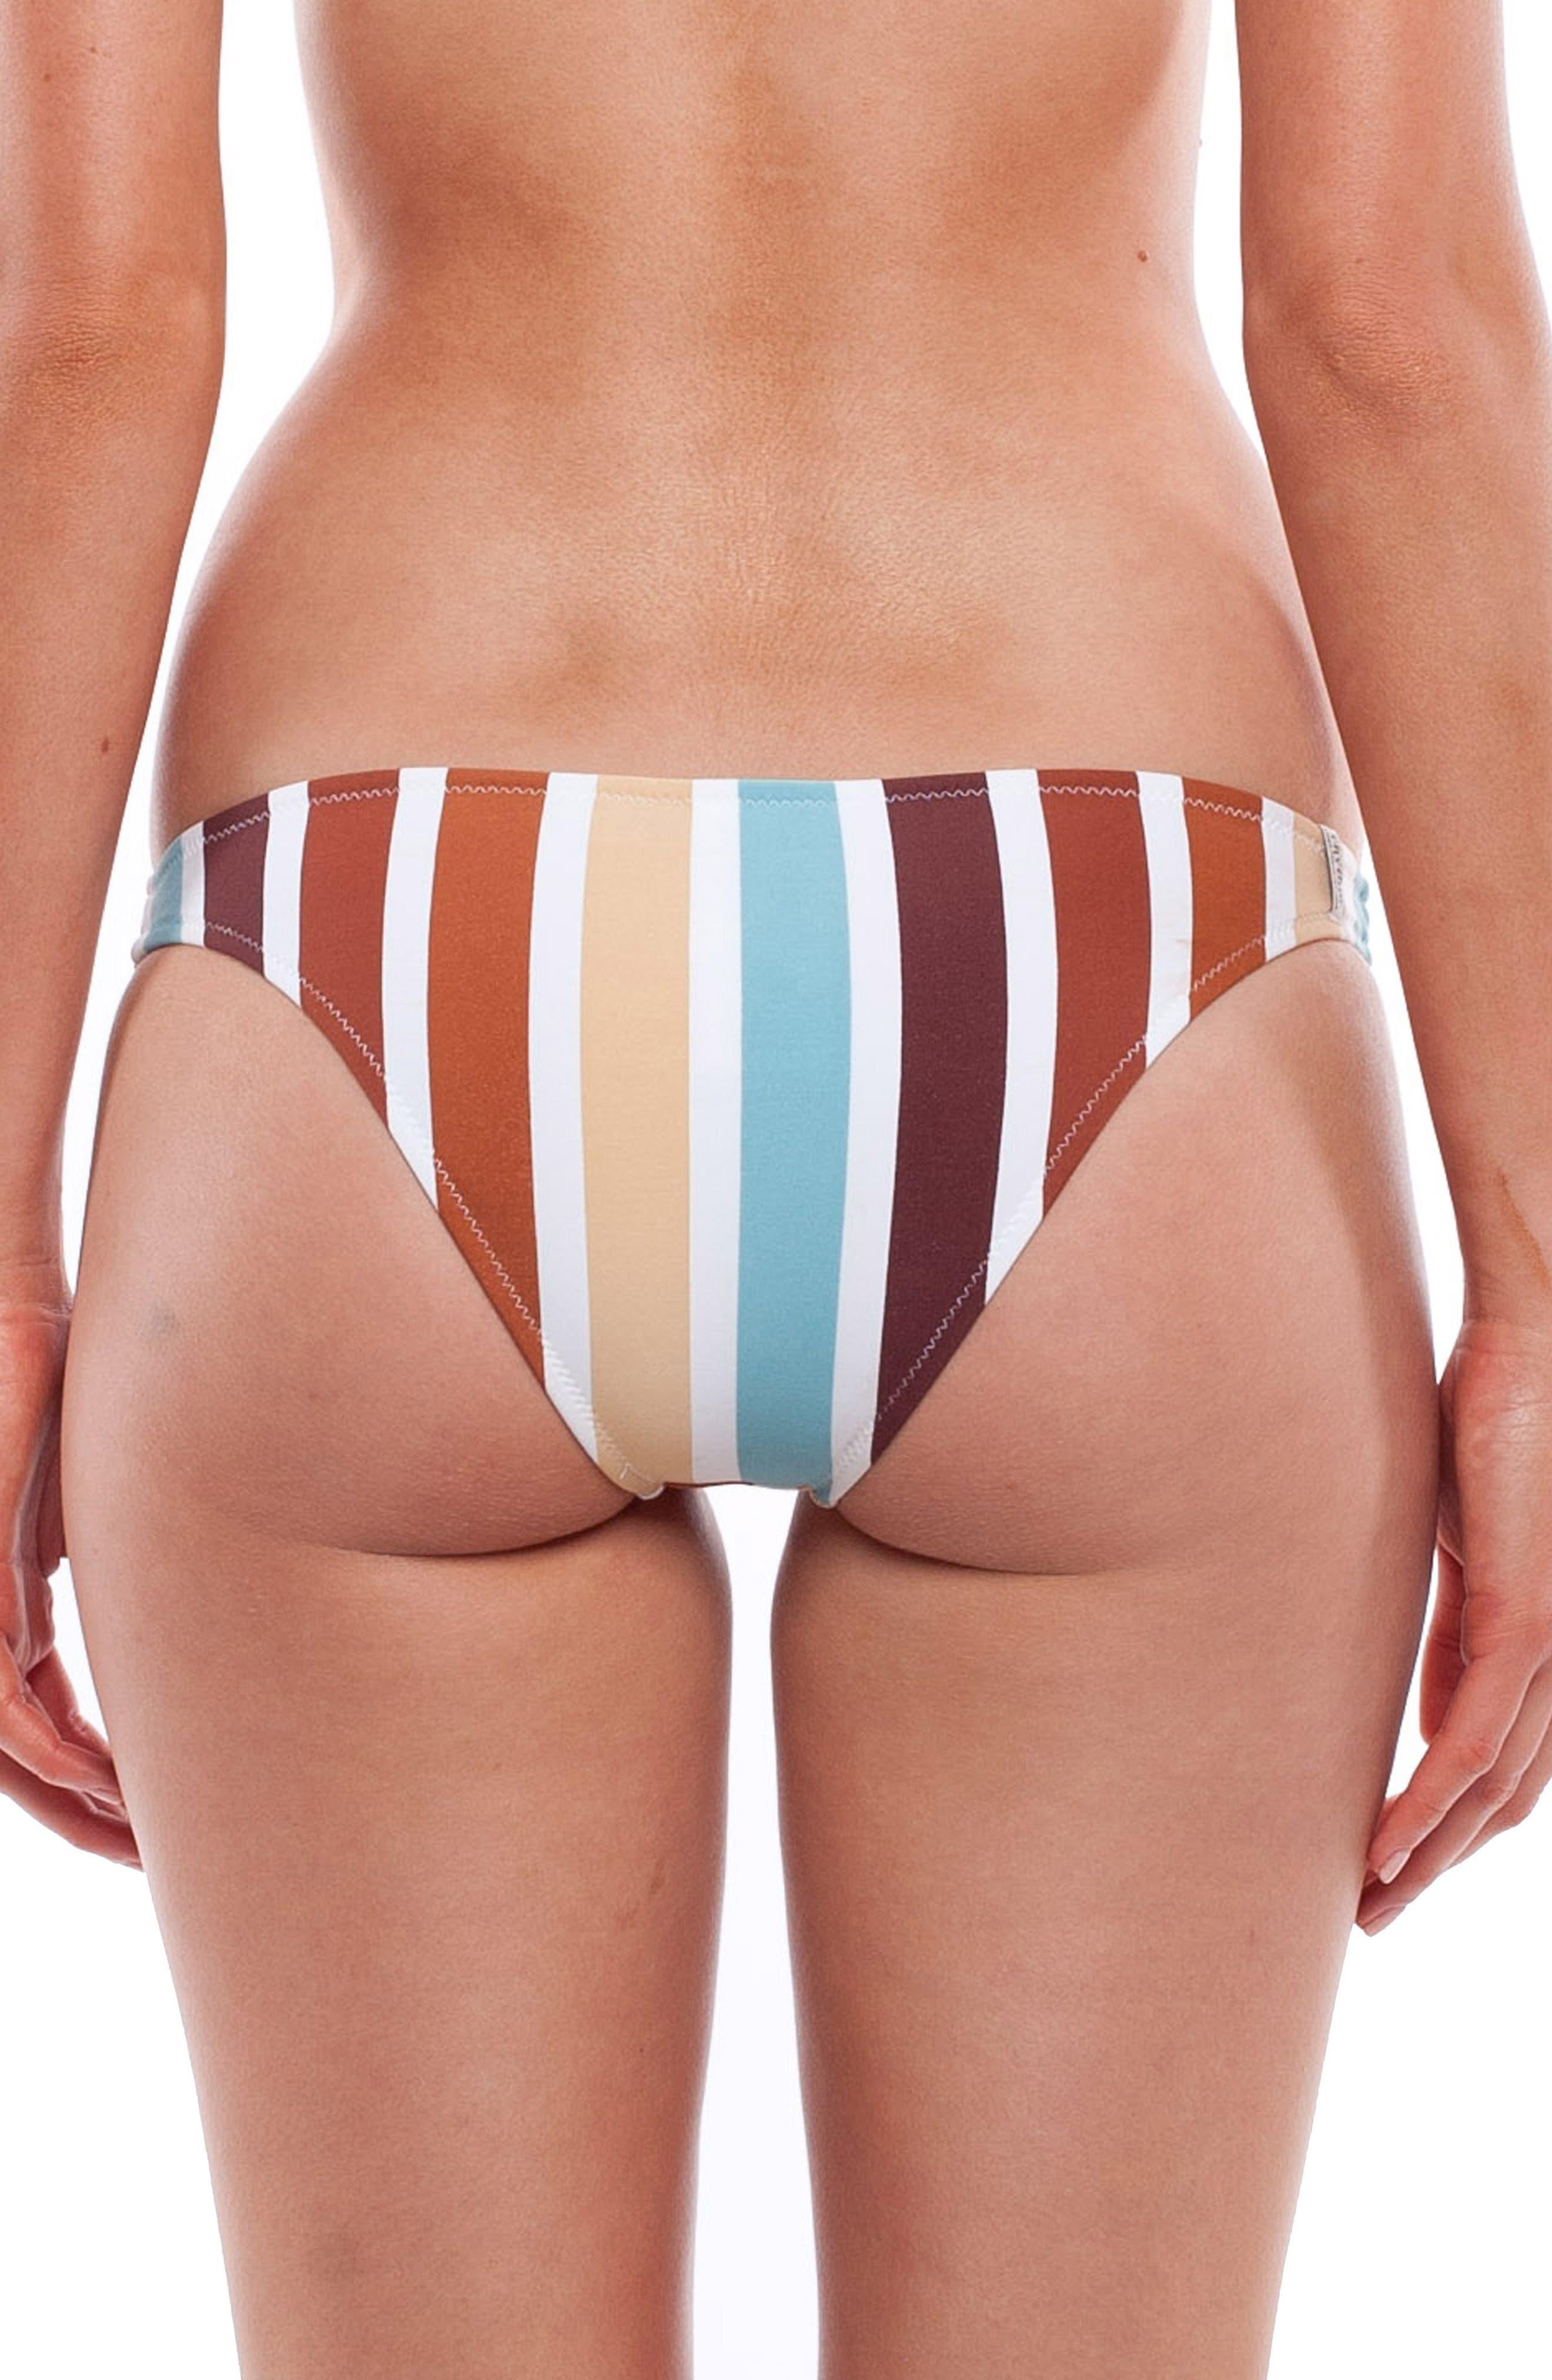 Zimbabwe Cheeky Bikini Bottoms,                         Main,                         color, Blue Multi